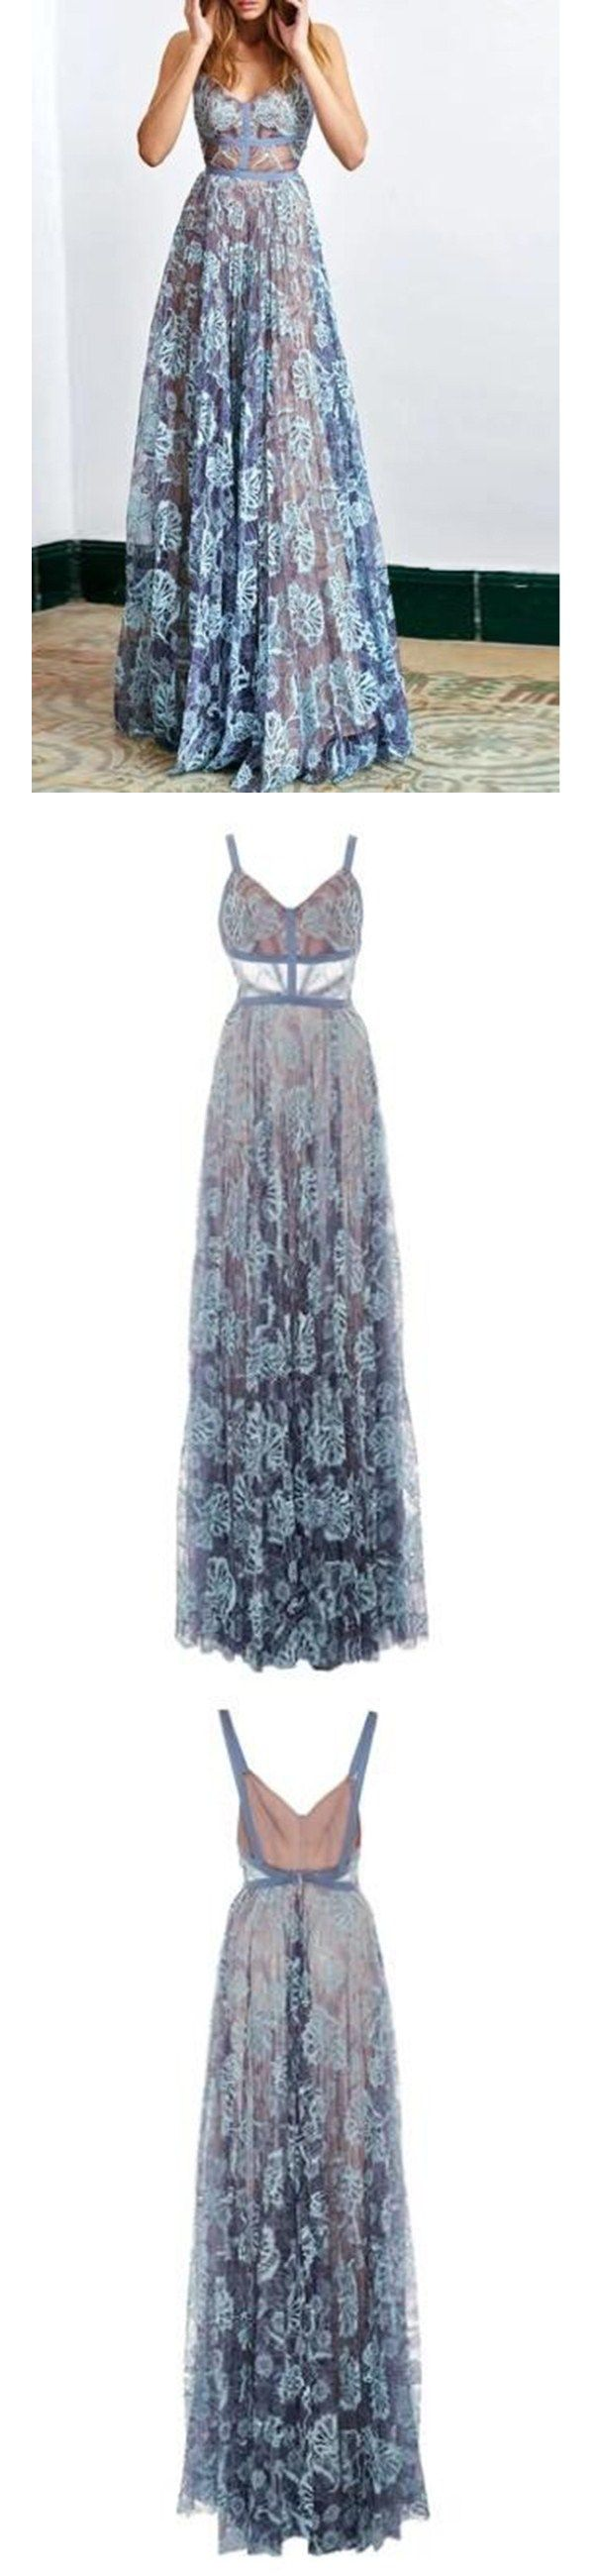 Chic Prom Dresses Spaghetti Straps Floor-length Lace Sexy Prom Dress/Evening Dress JKL188